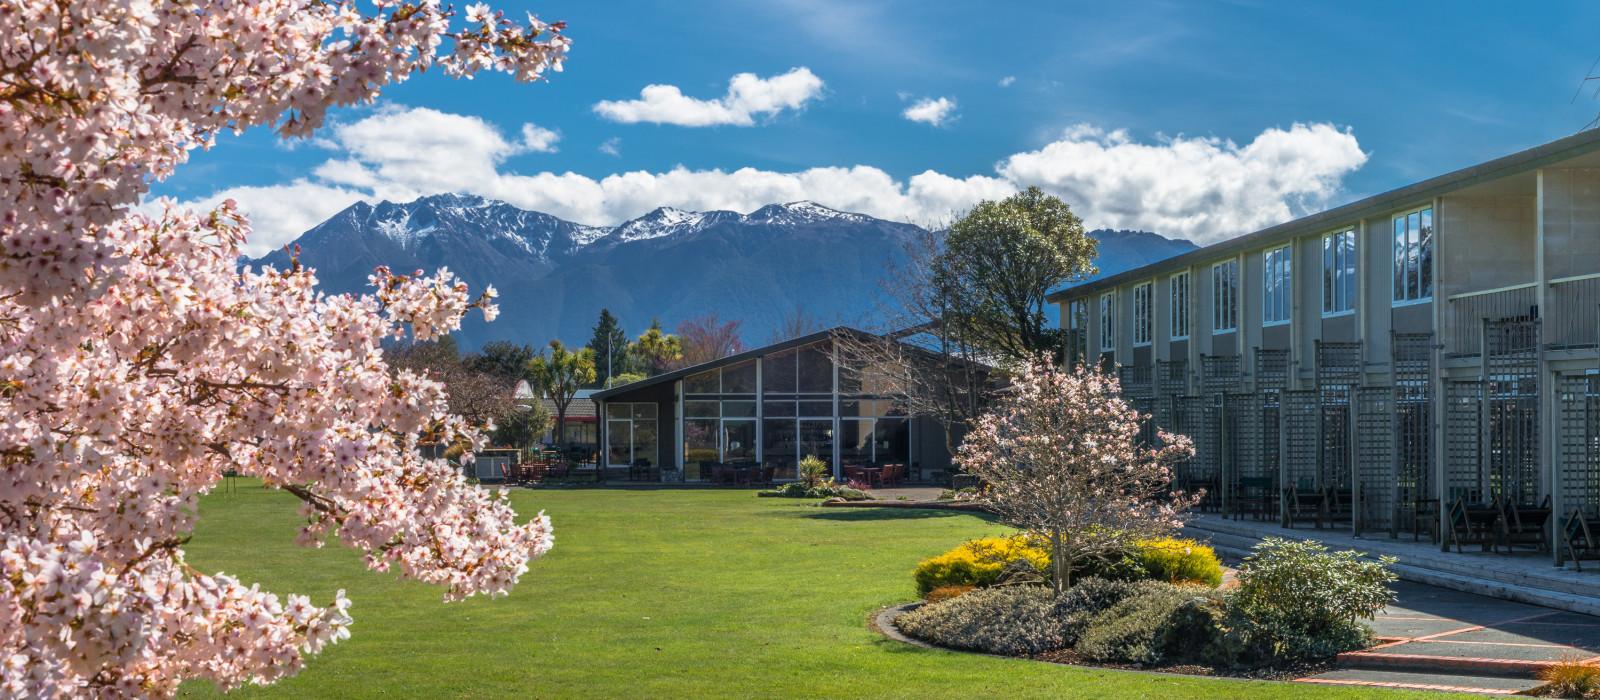 Hotel Distinction  and Villas Lake Te Anau New Zealand